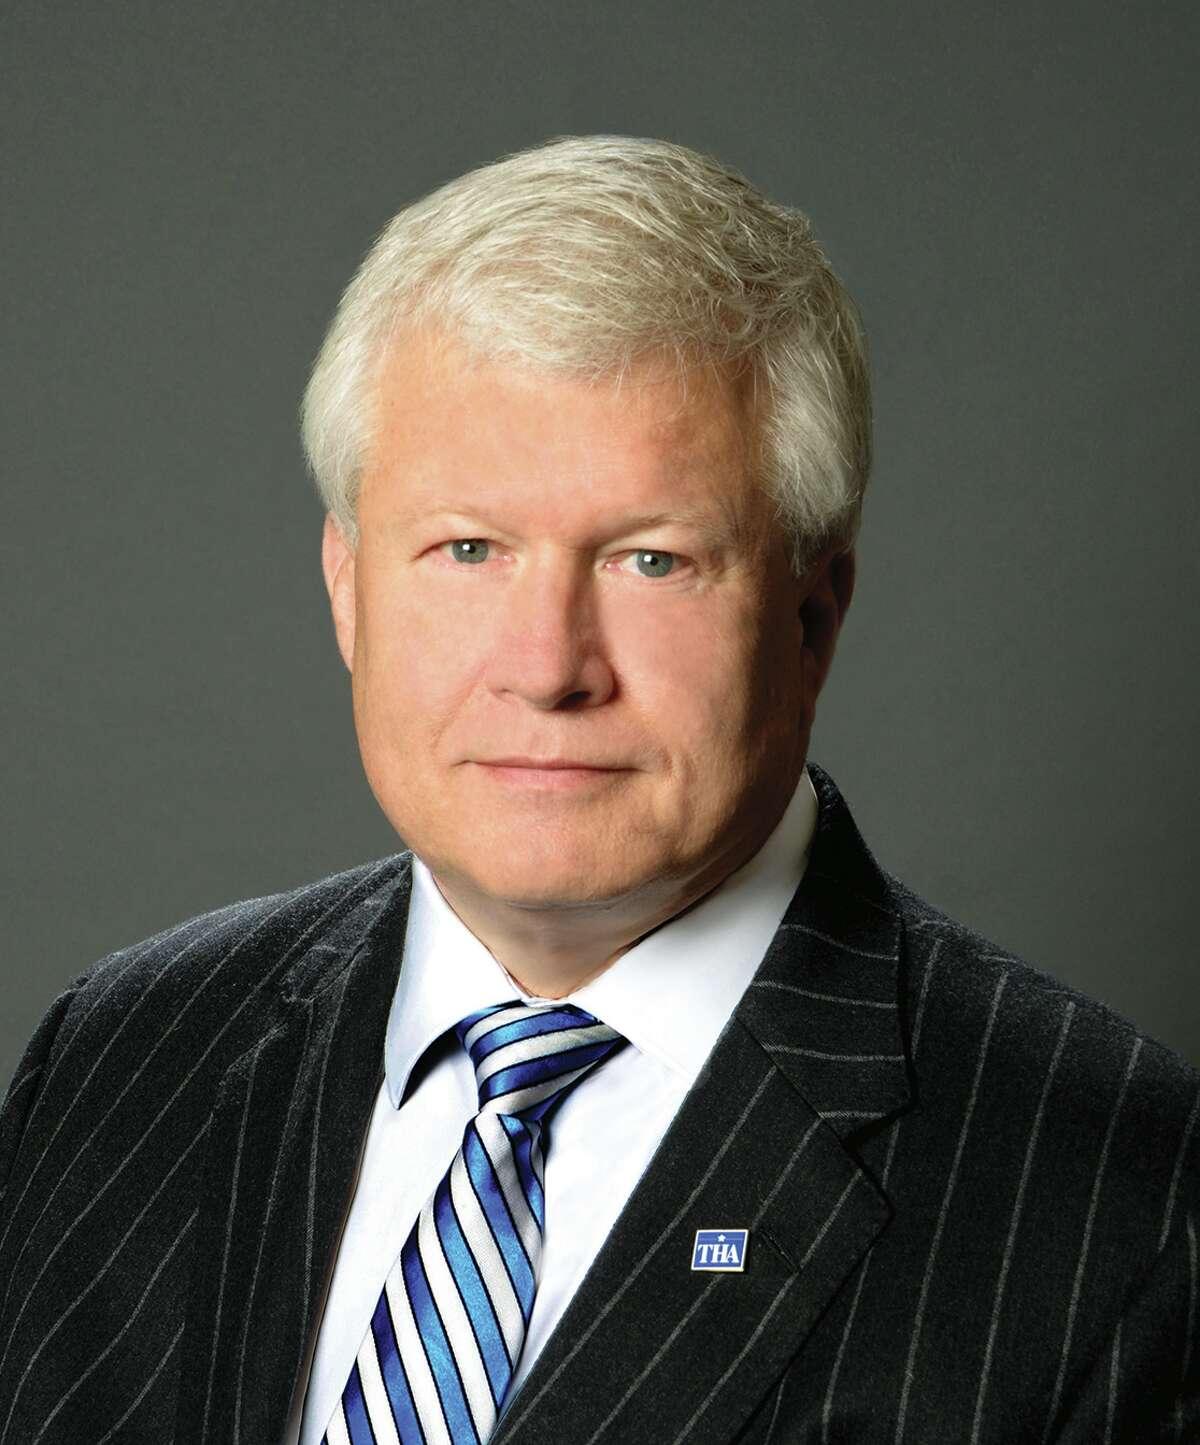 Ted Shaw, Texas Hospital Association CEO